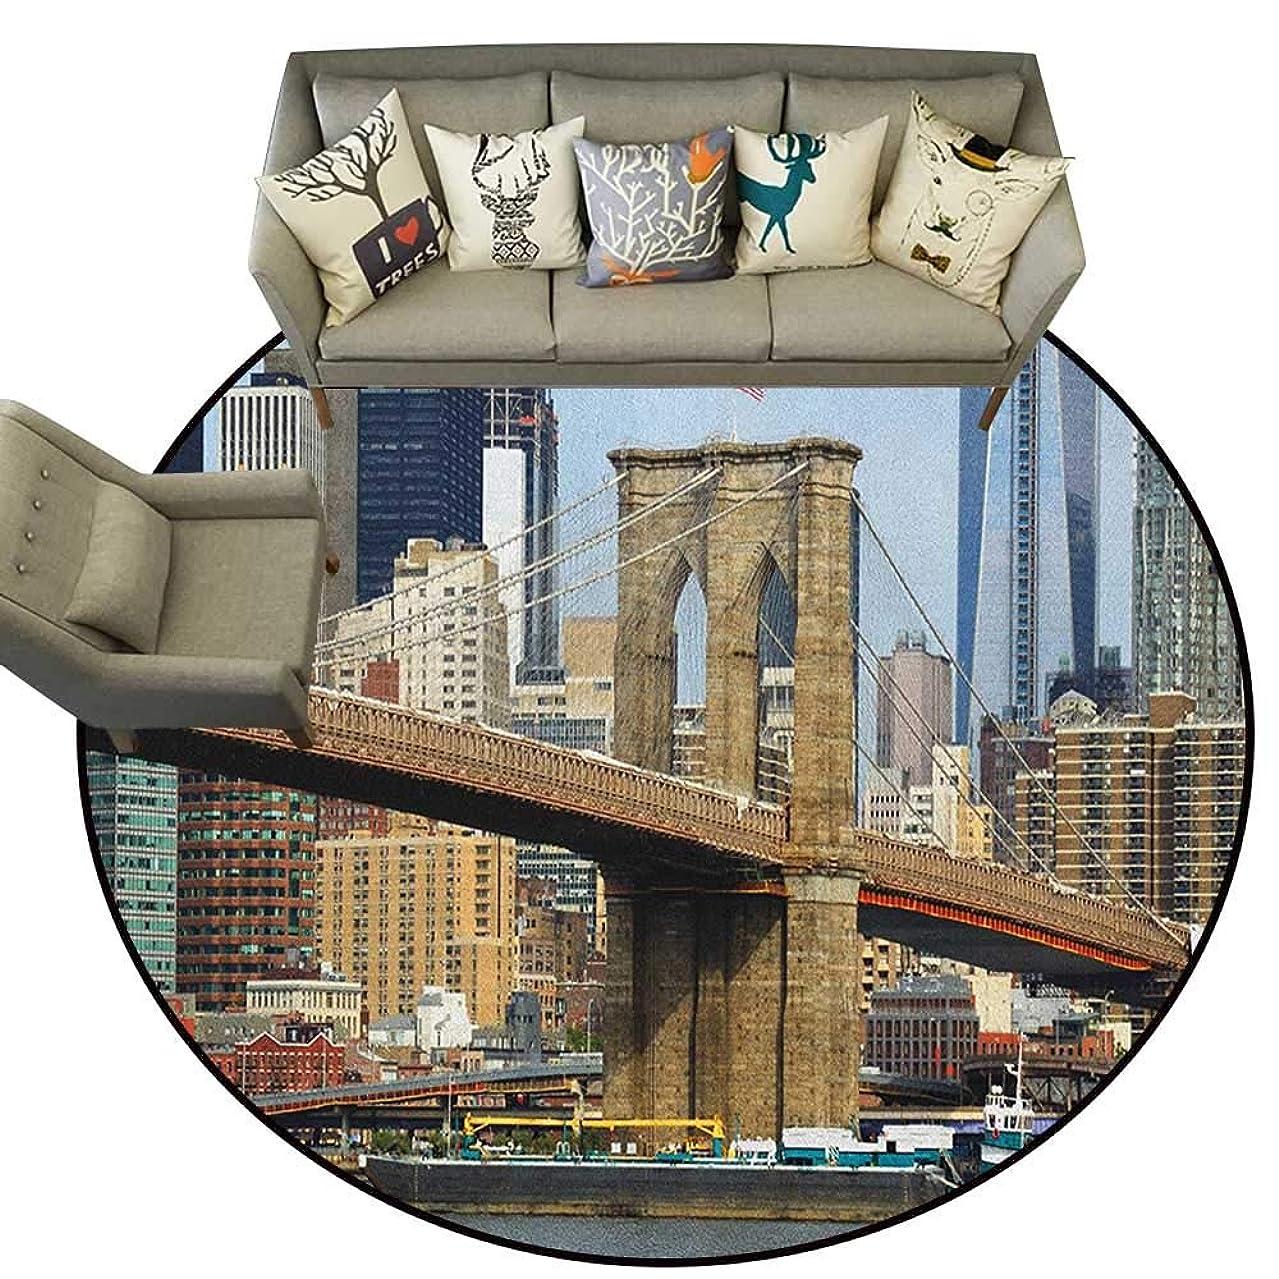 Urban,Custom Floor mats Skyline of Brooklyn New York USA Cityscape Bridge Buildings and River Coastal Scenery D78 Multi-USE Floor MAT